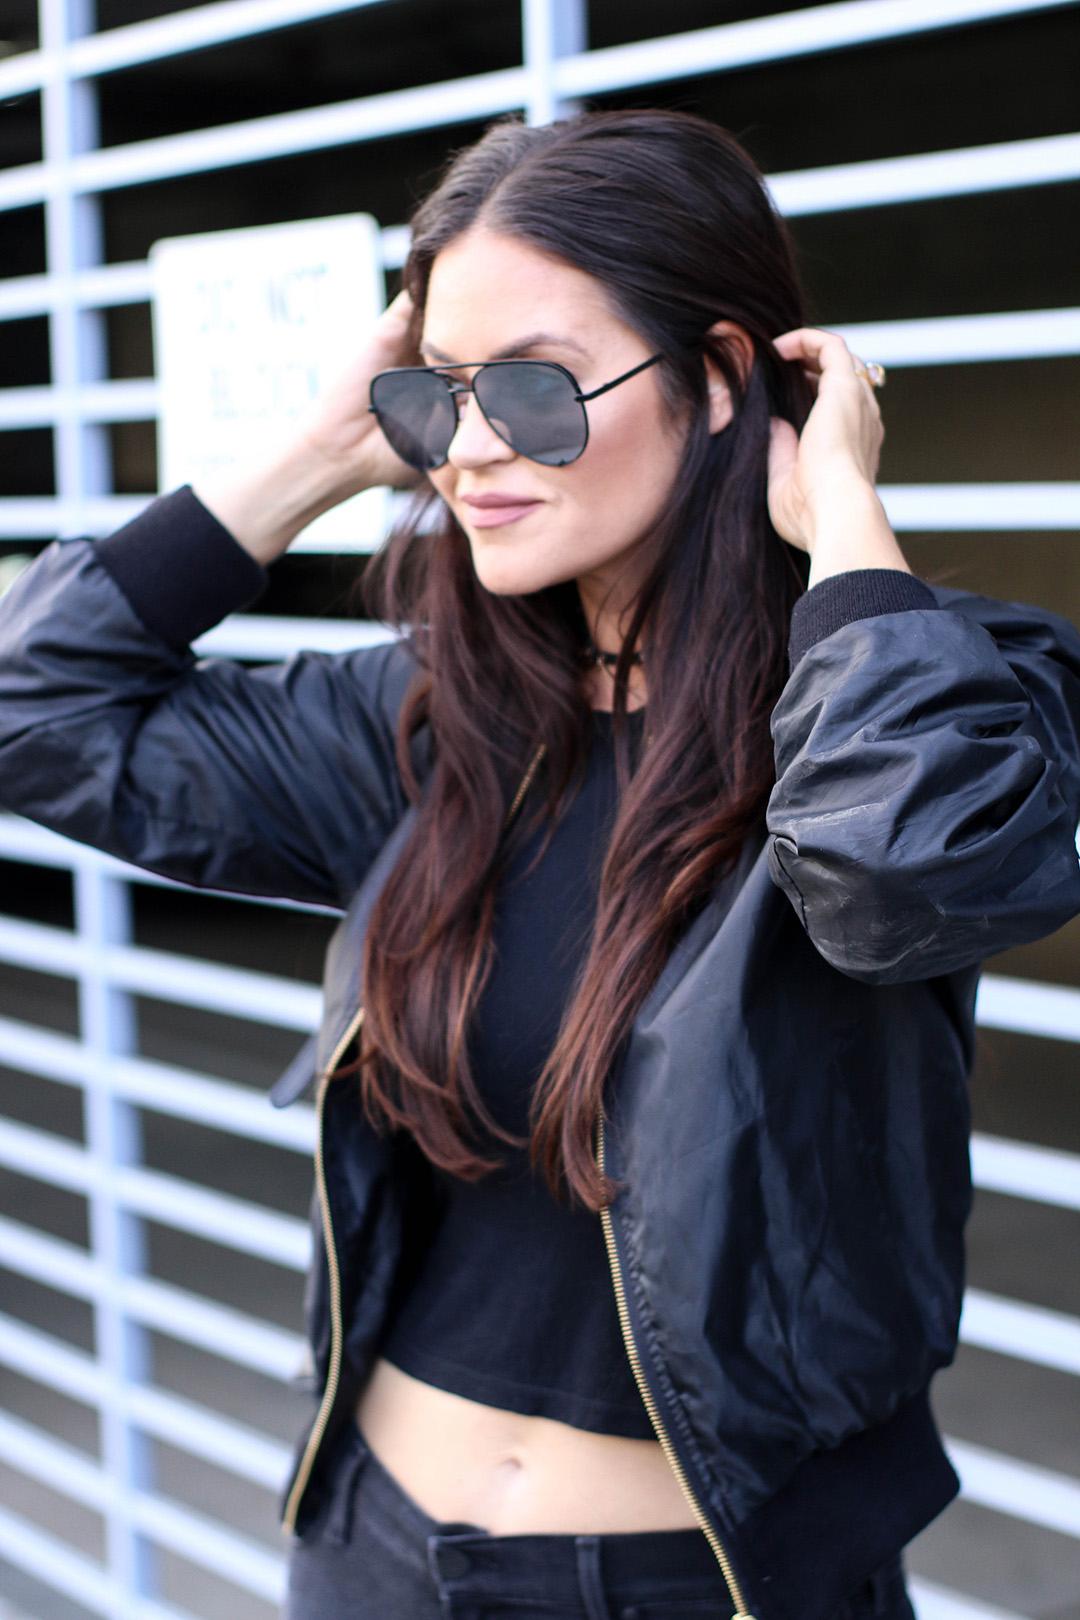 crop top, high key sunglasses